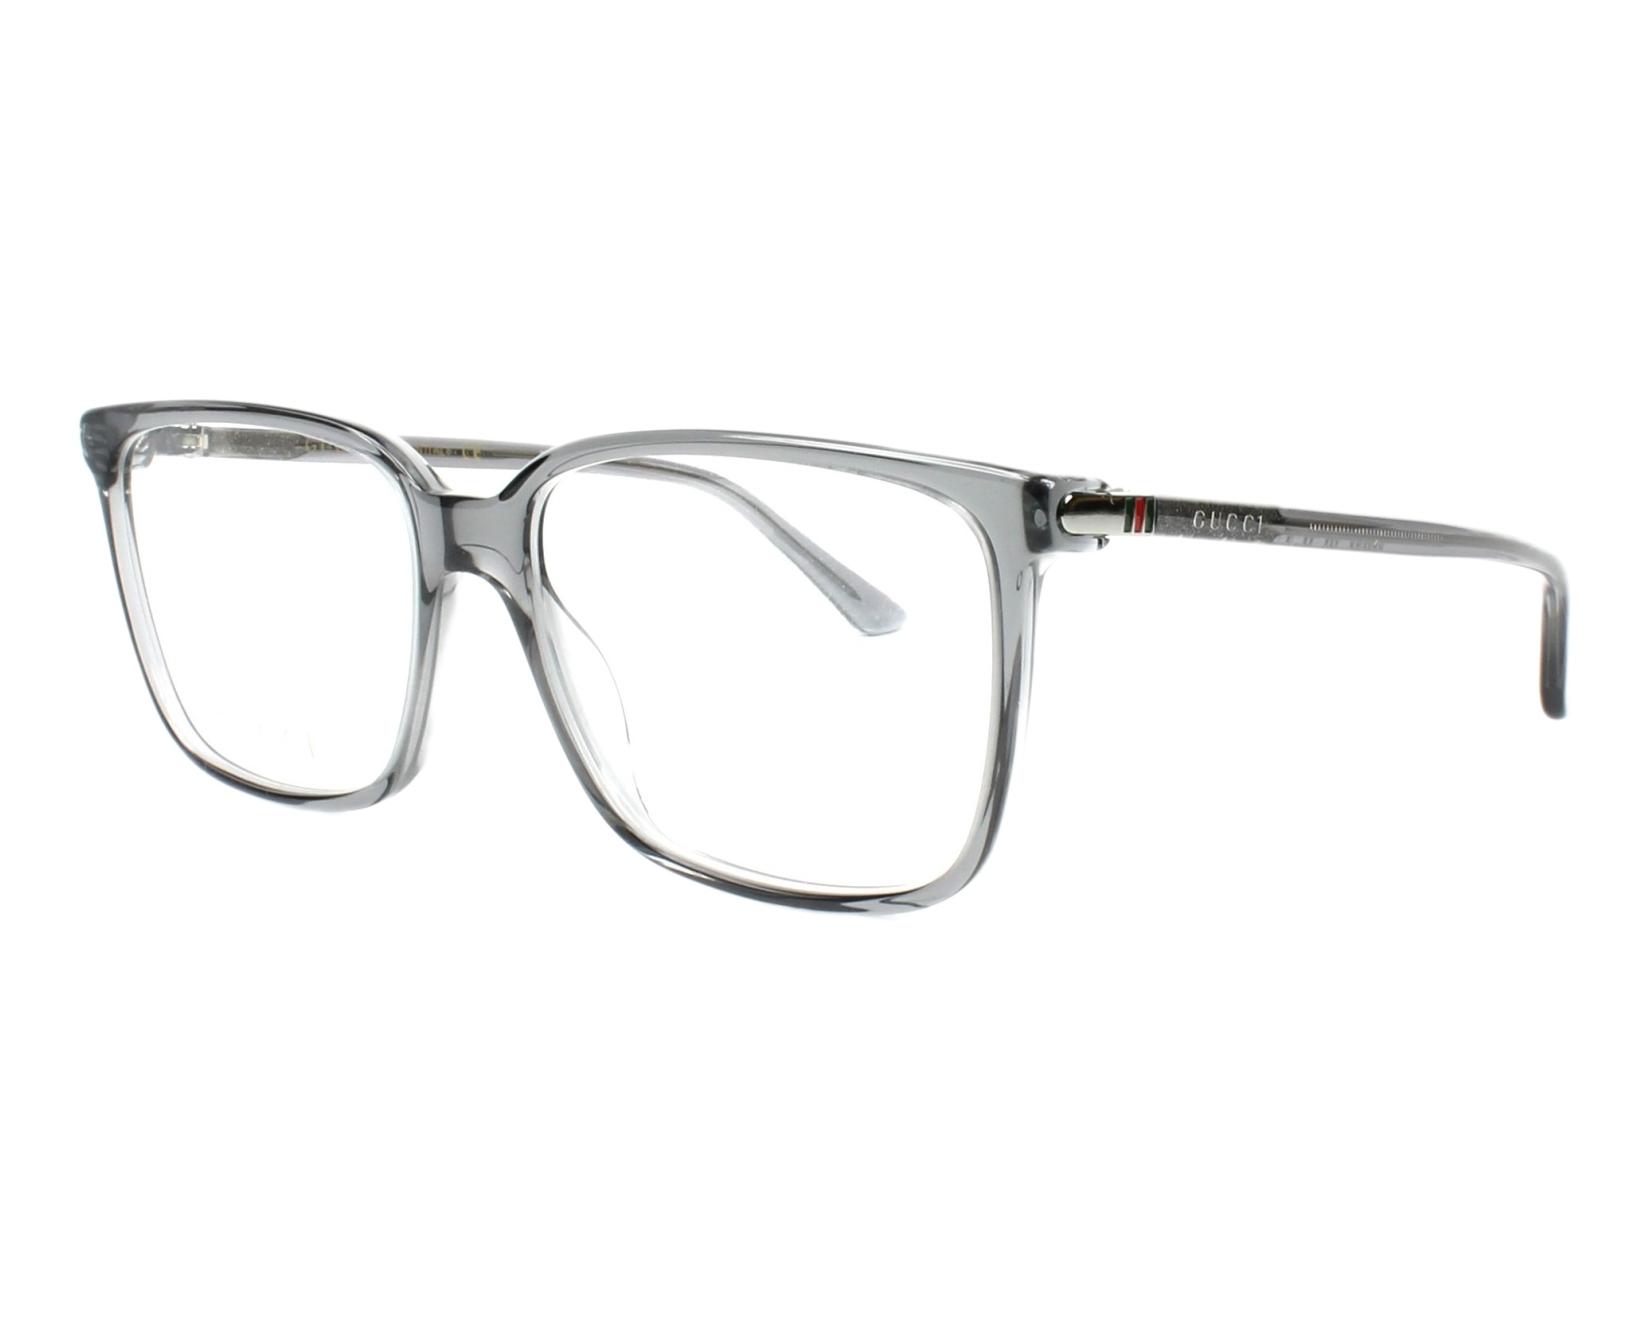 beccb180961 eyeglasses Gucci GG-00190 003 - Grey profile view